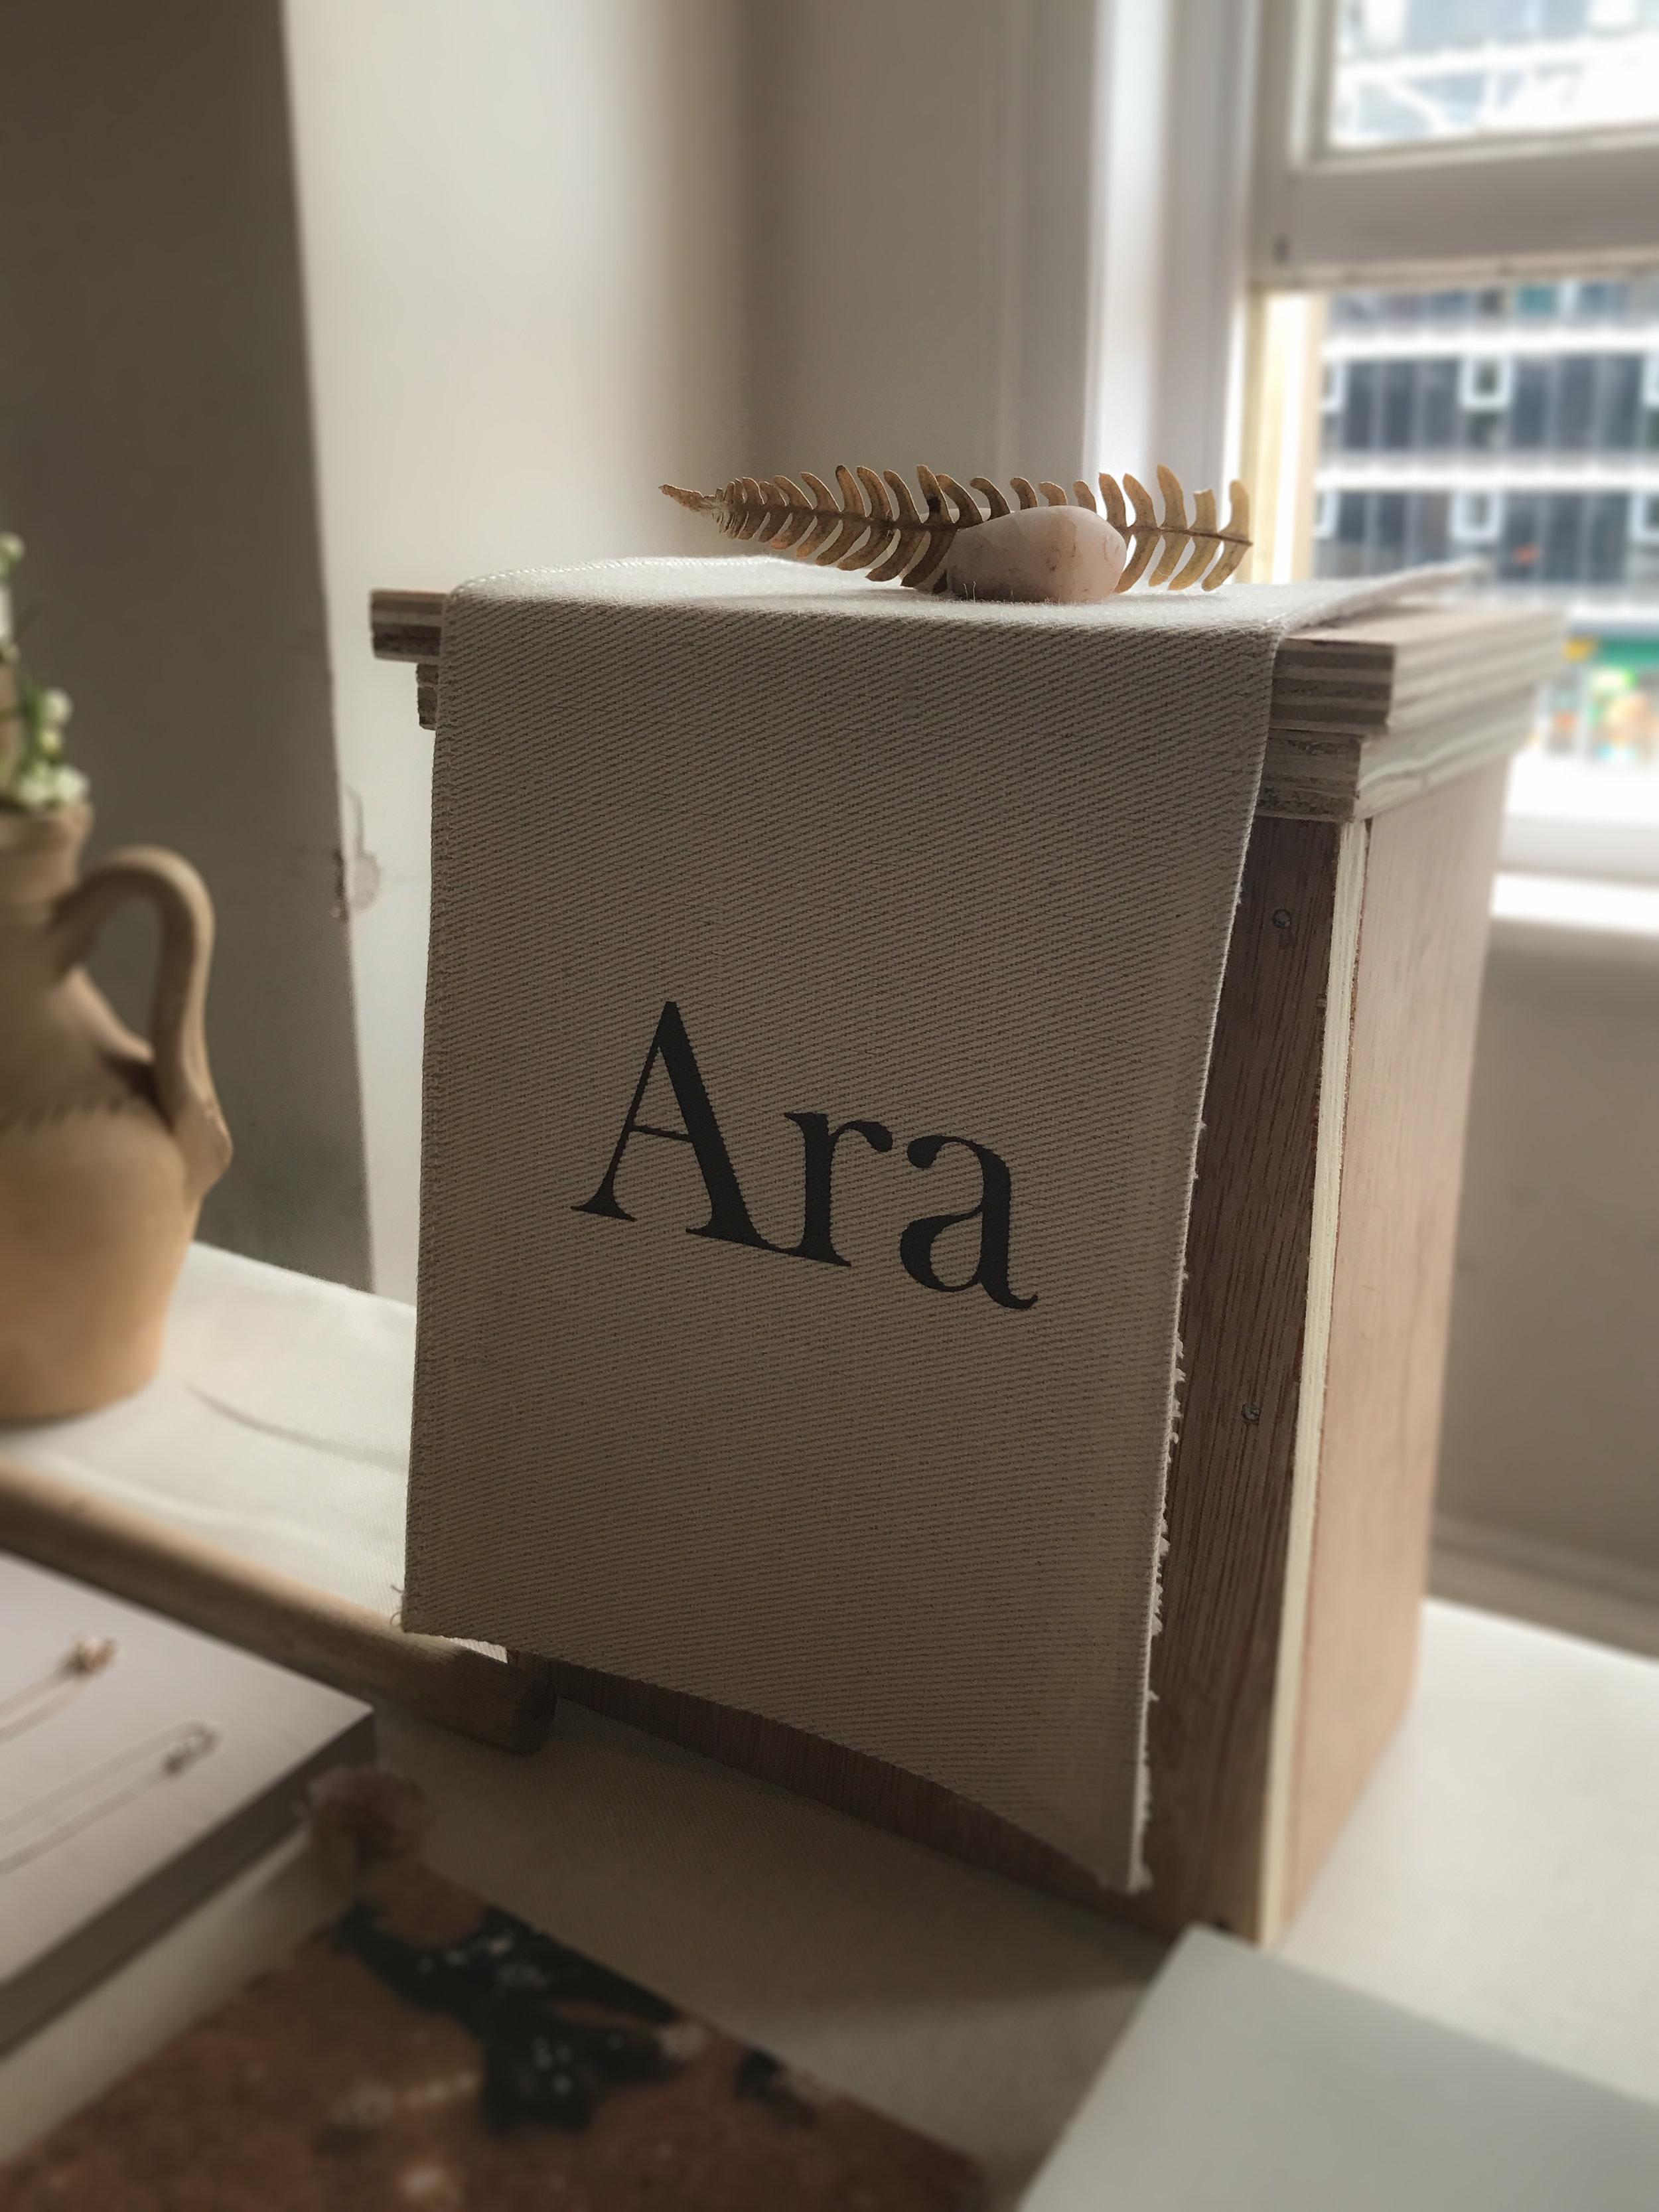 Ara the altar - a lammas gathering - the altar